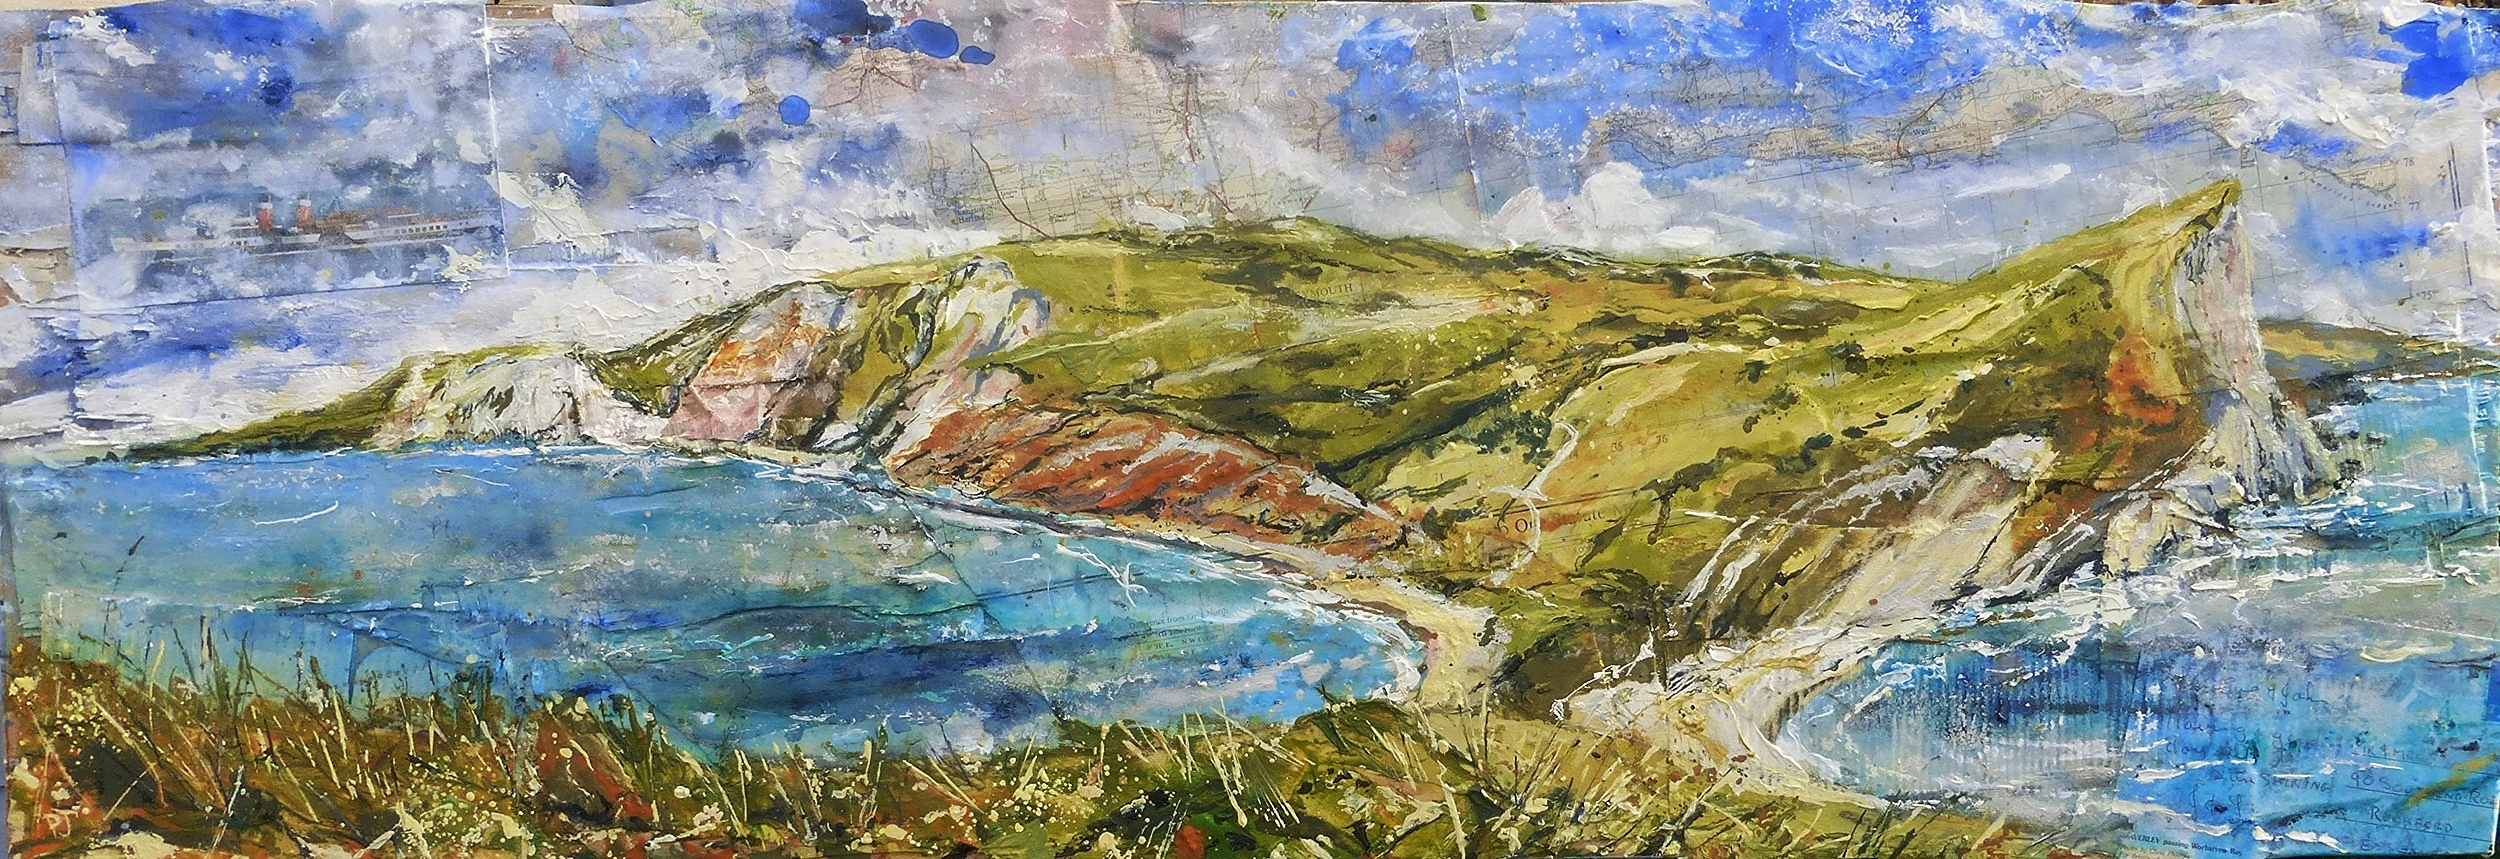 Worbarrow Bay to Brandy Bay, Purbeck Coast, Dorset. Oil, acrylic, collage on wood.